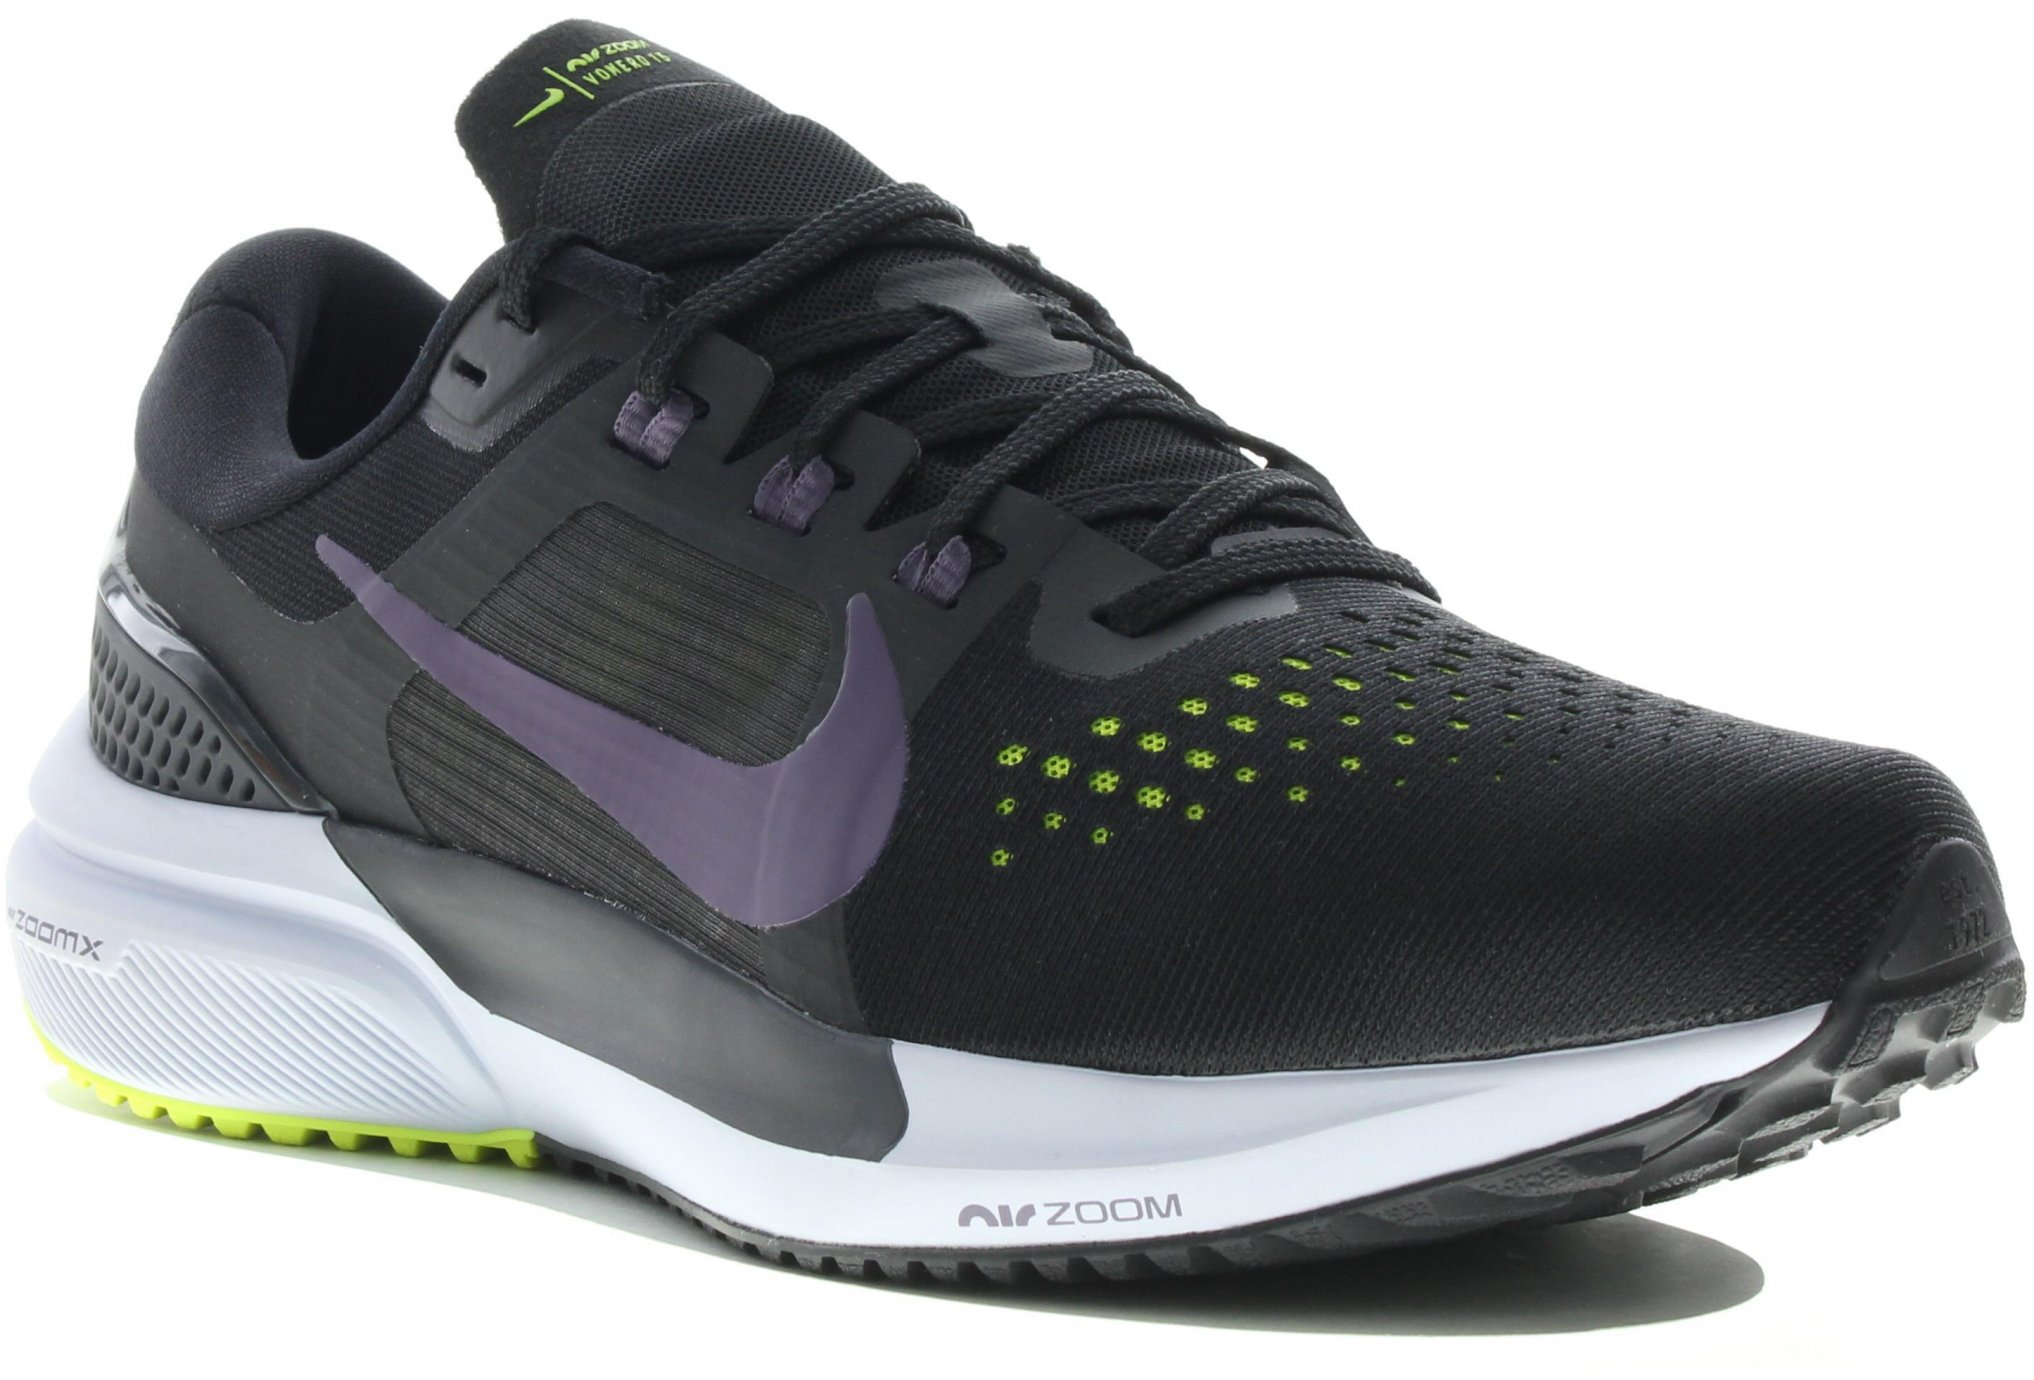 Nike Air Zoom Vomero 15 W Chaussures running femme